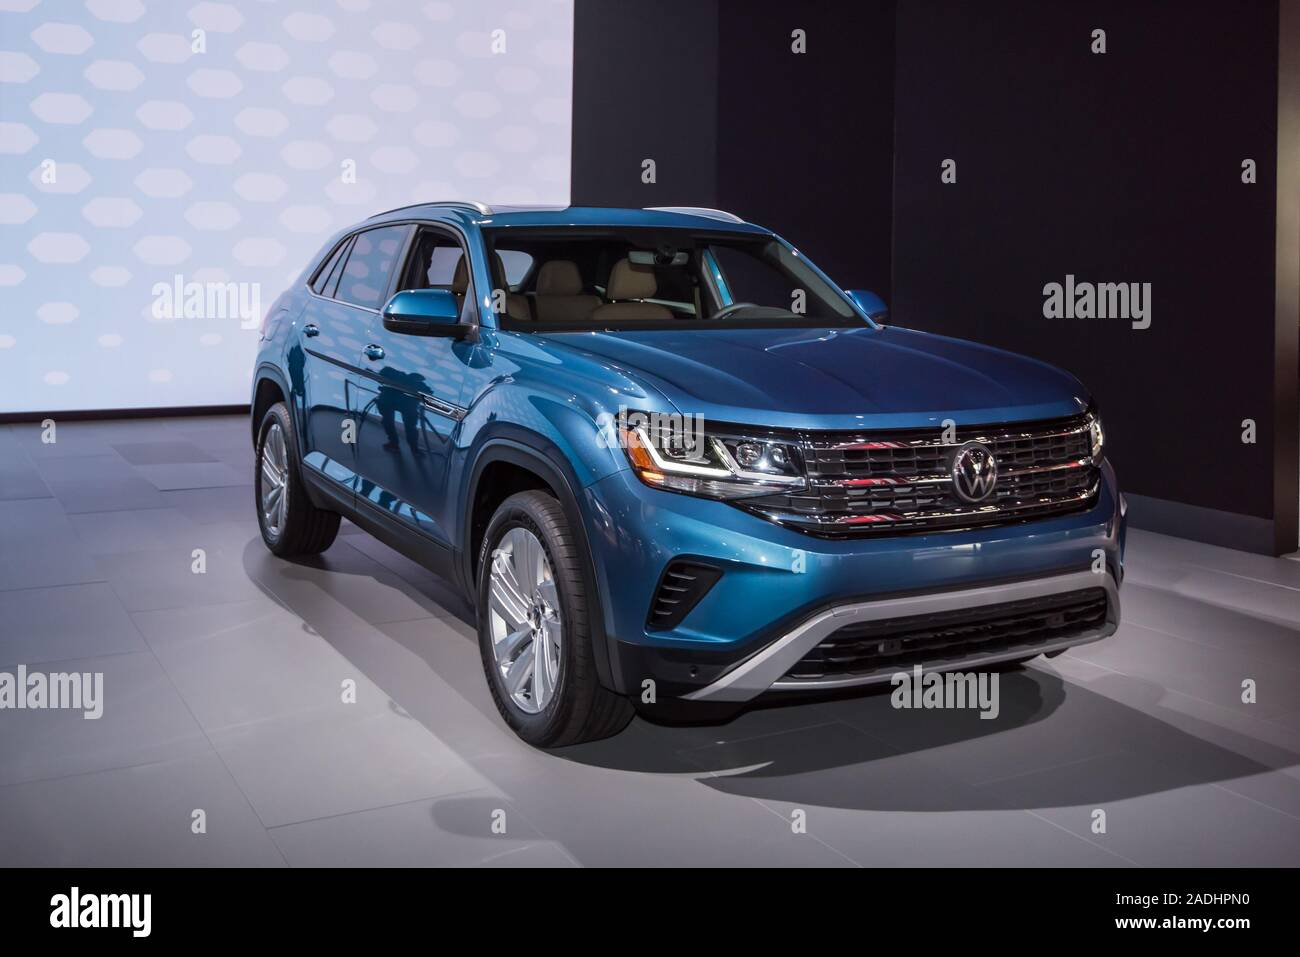 Los Angeles Ca Usa November 20 2019 A 2020 Volkswagen Atlas Cross Sport Suv At The Los Angeles Auto Show Stock Photo Alamy